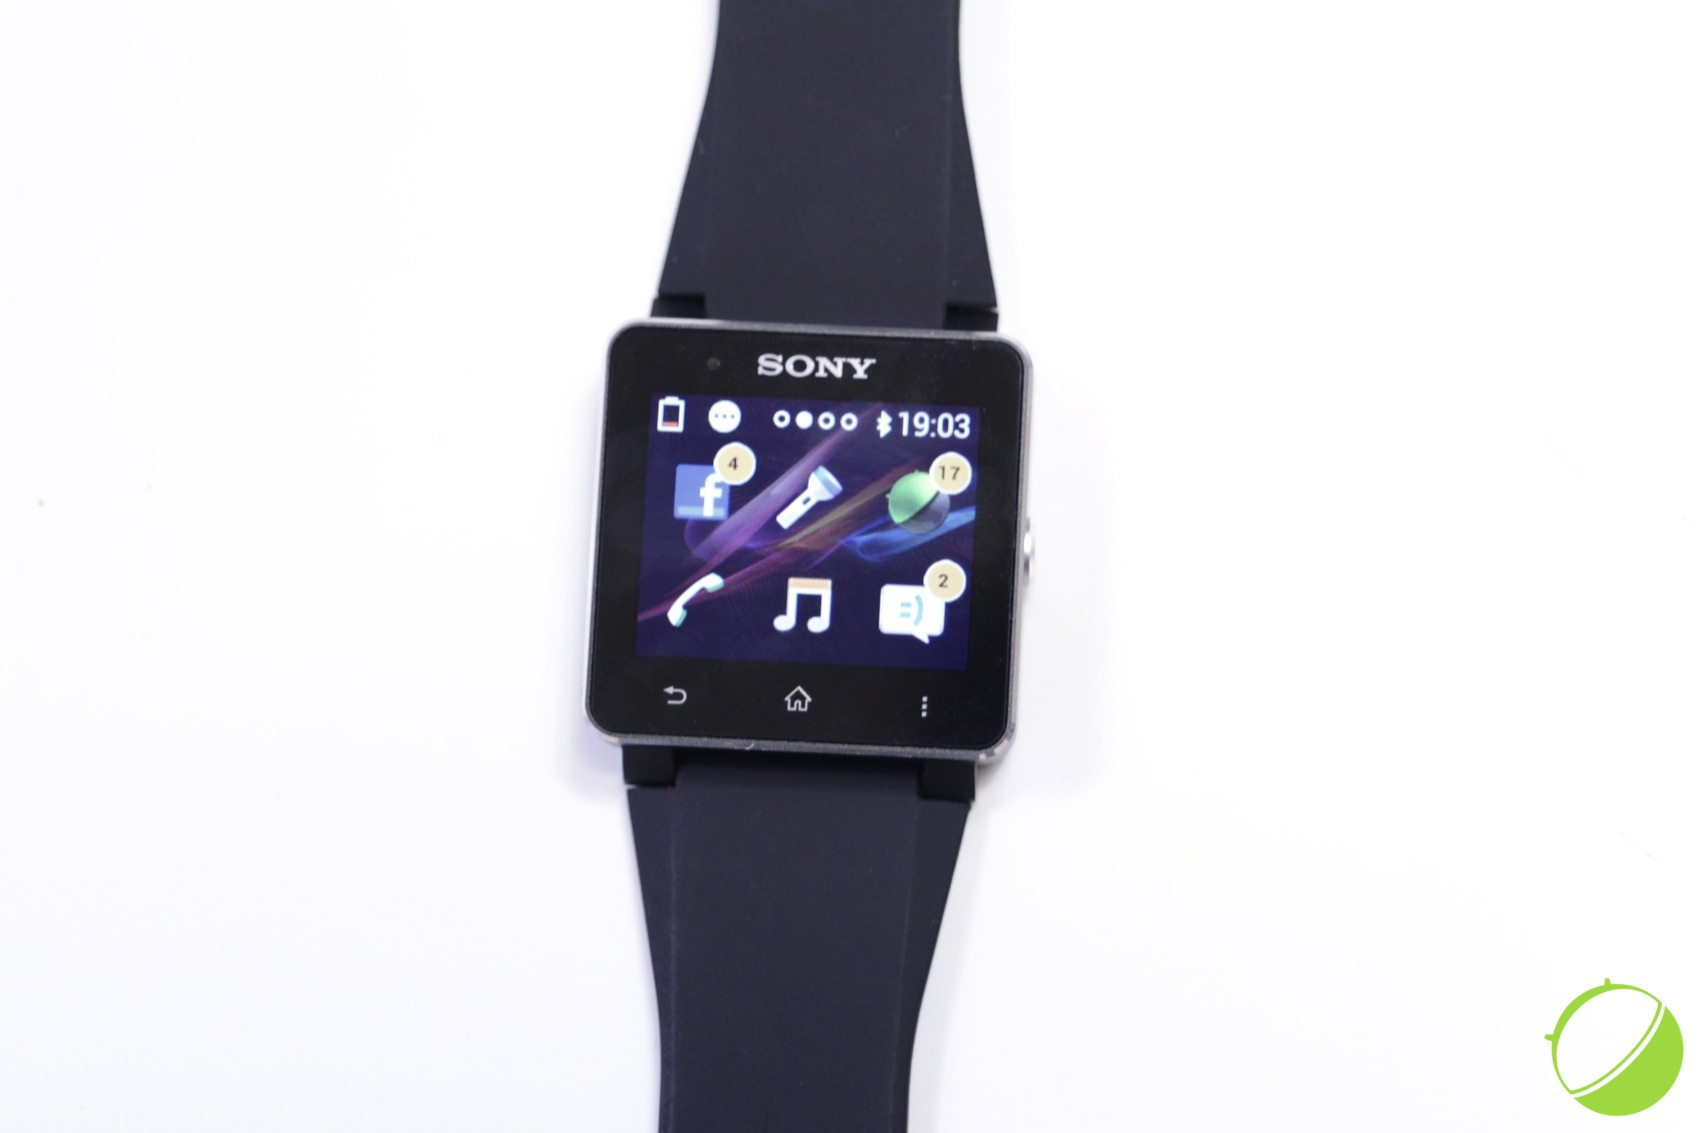 caracteristique montre sony smartwatch 2. Black Bedroom Furniture Sets. Home Design Ideas